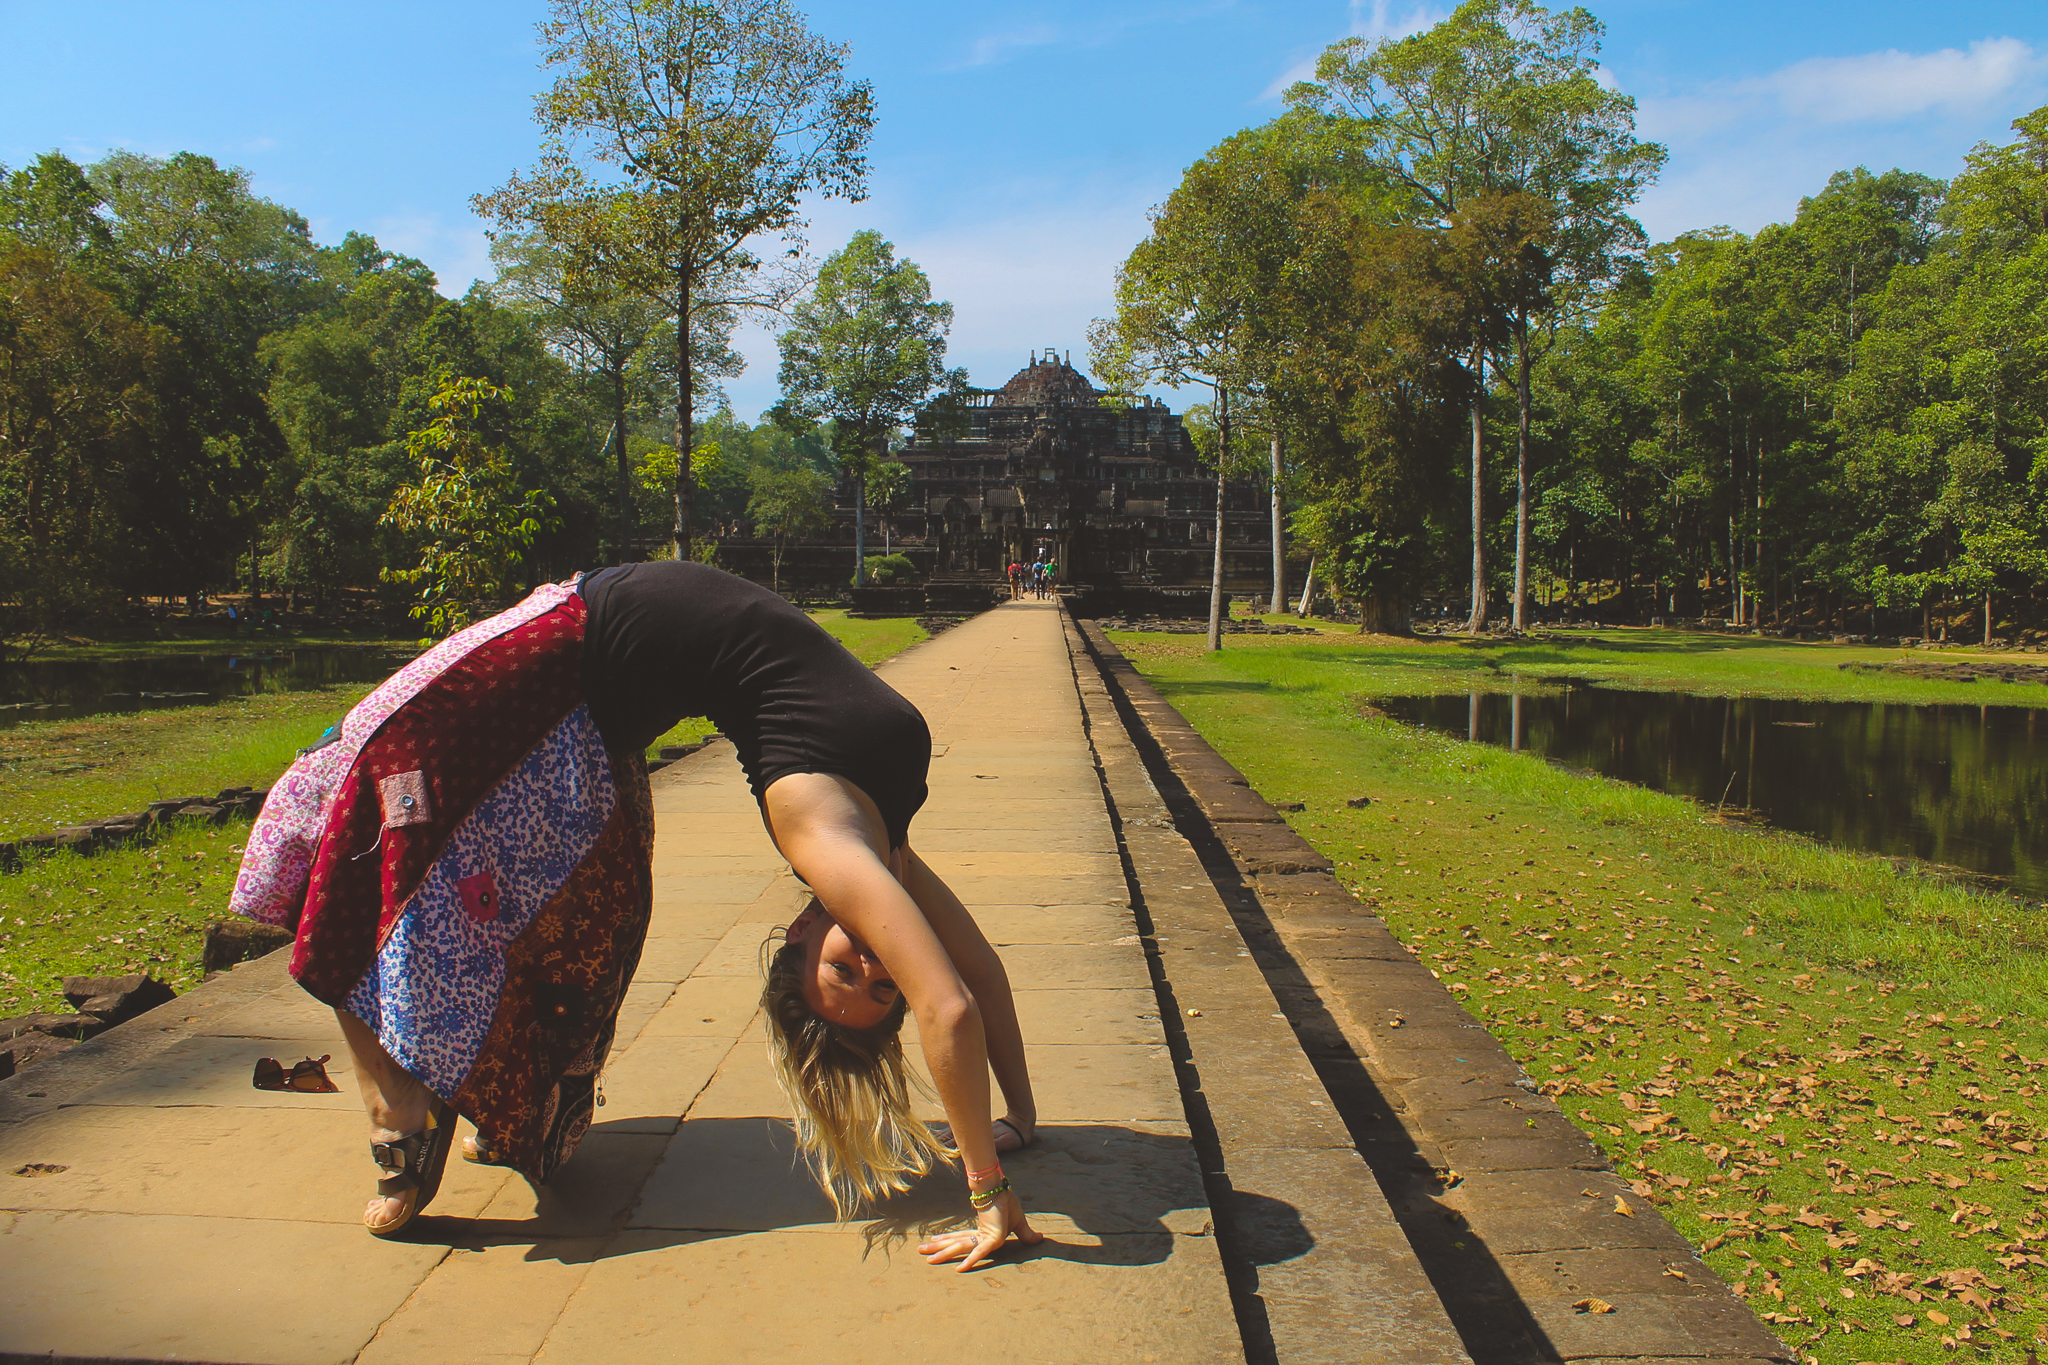 cambodia blog (17 of 34).jpg